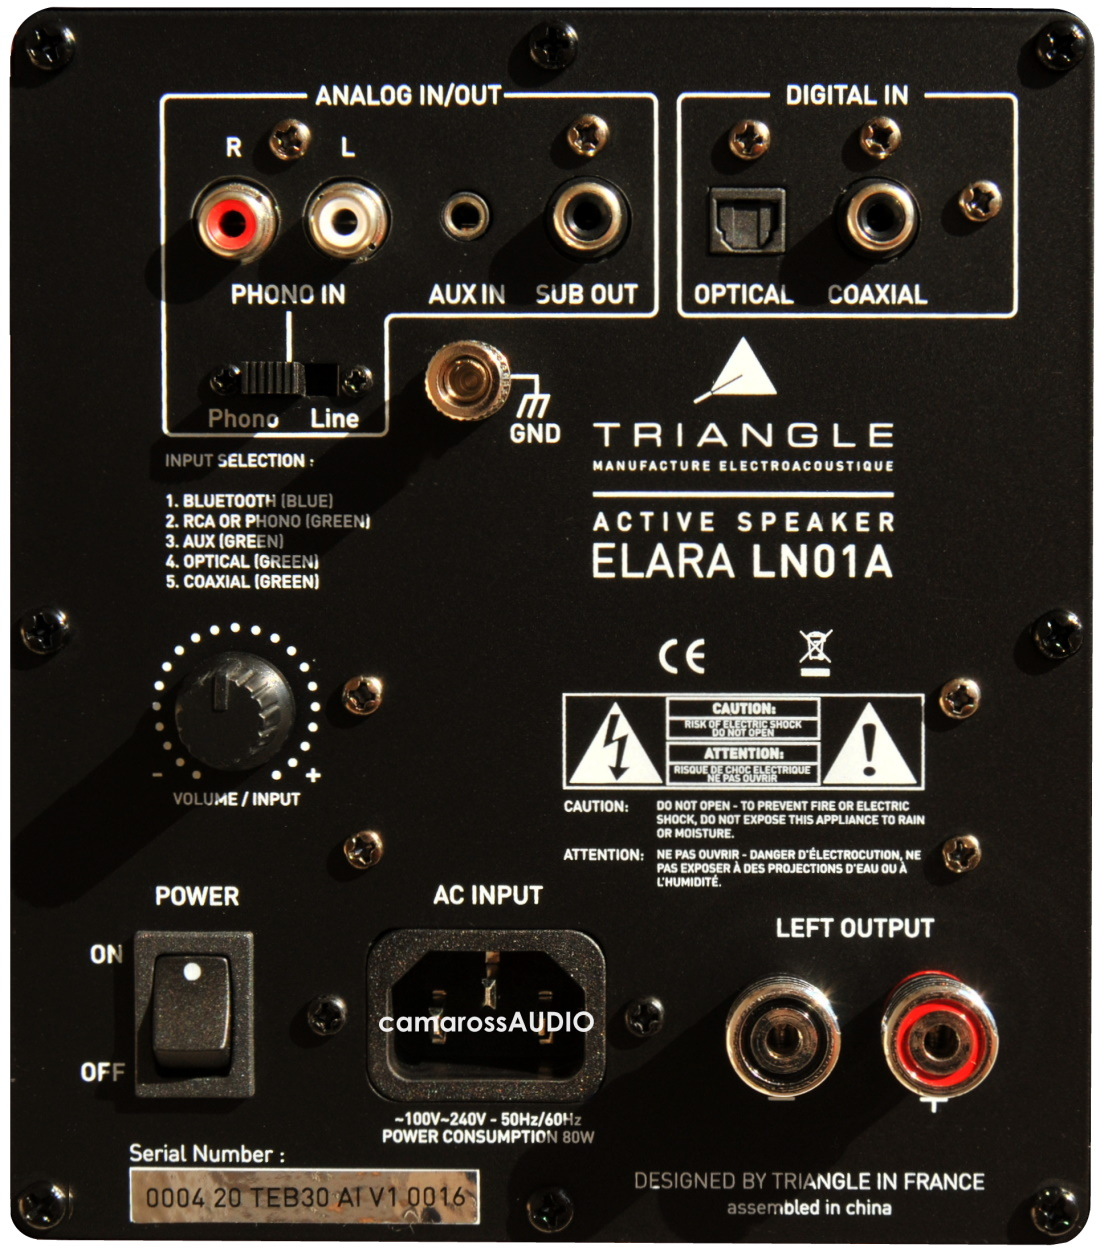 triangle-elara-ln01a-amp-camarossaudio (